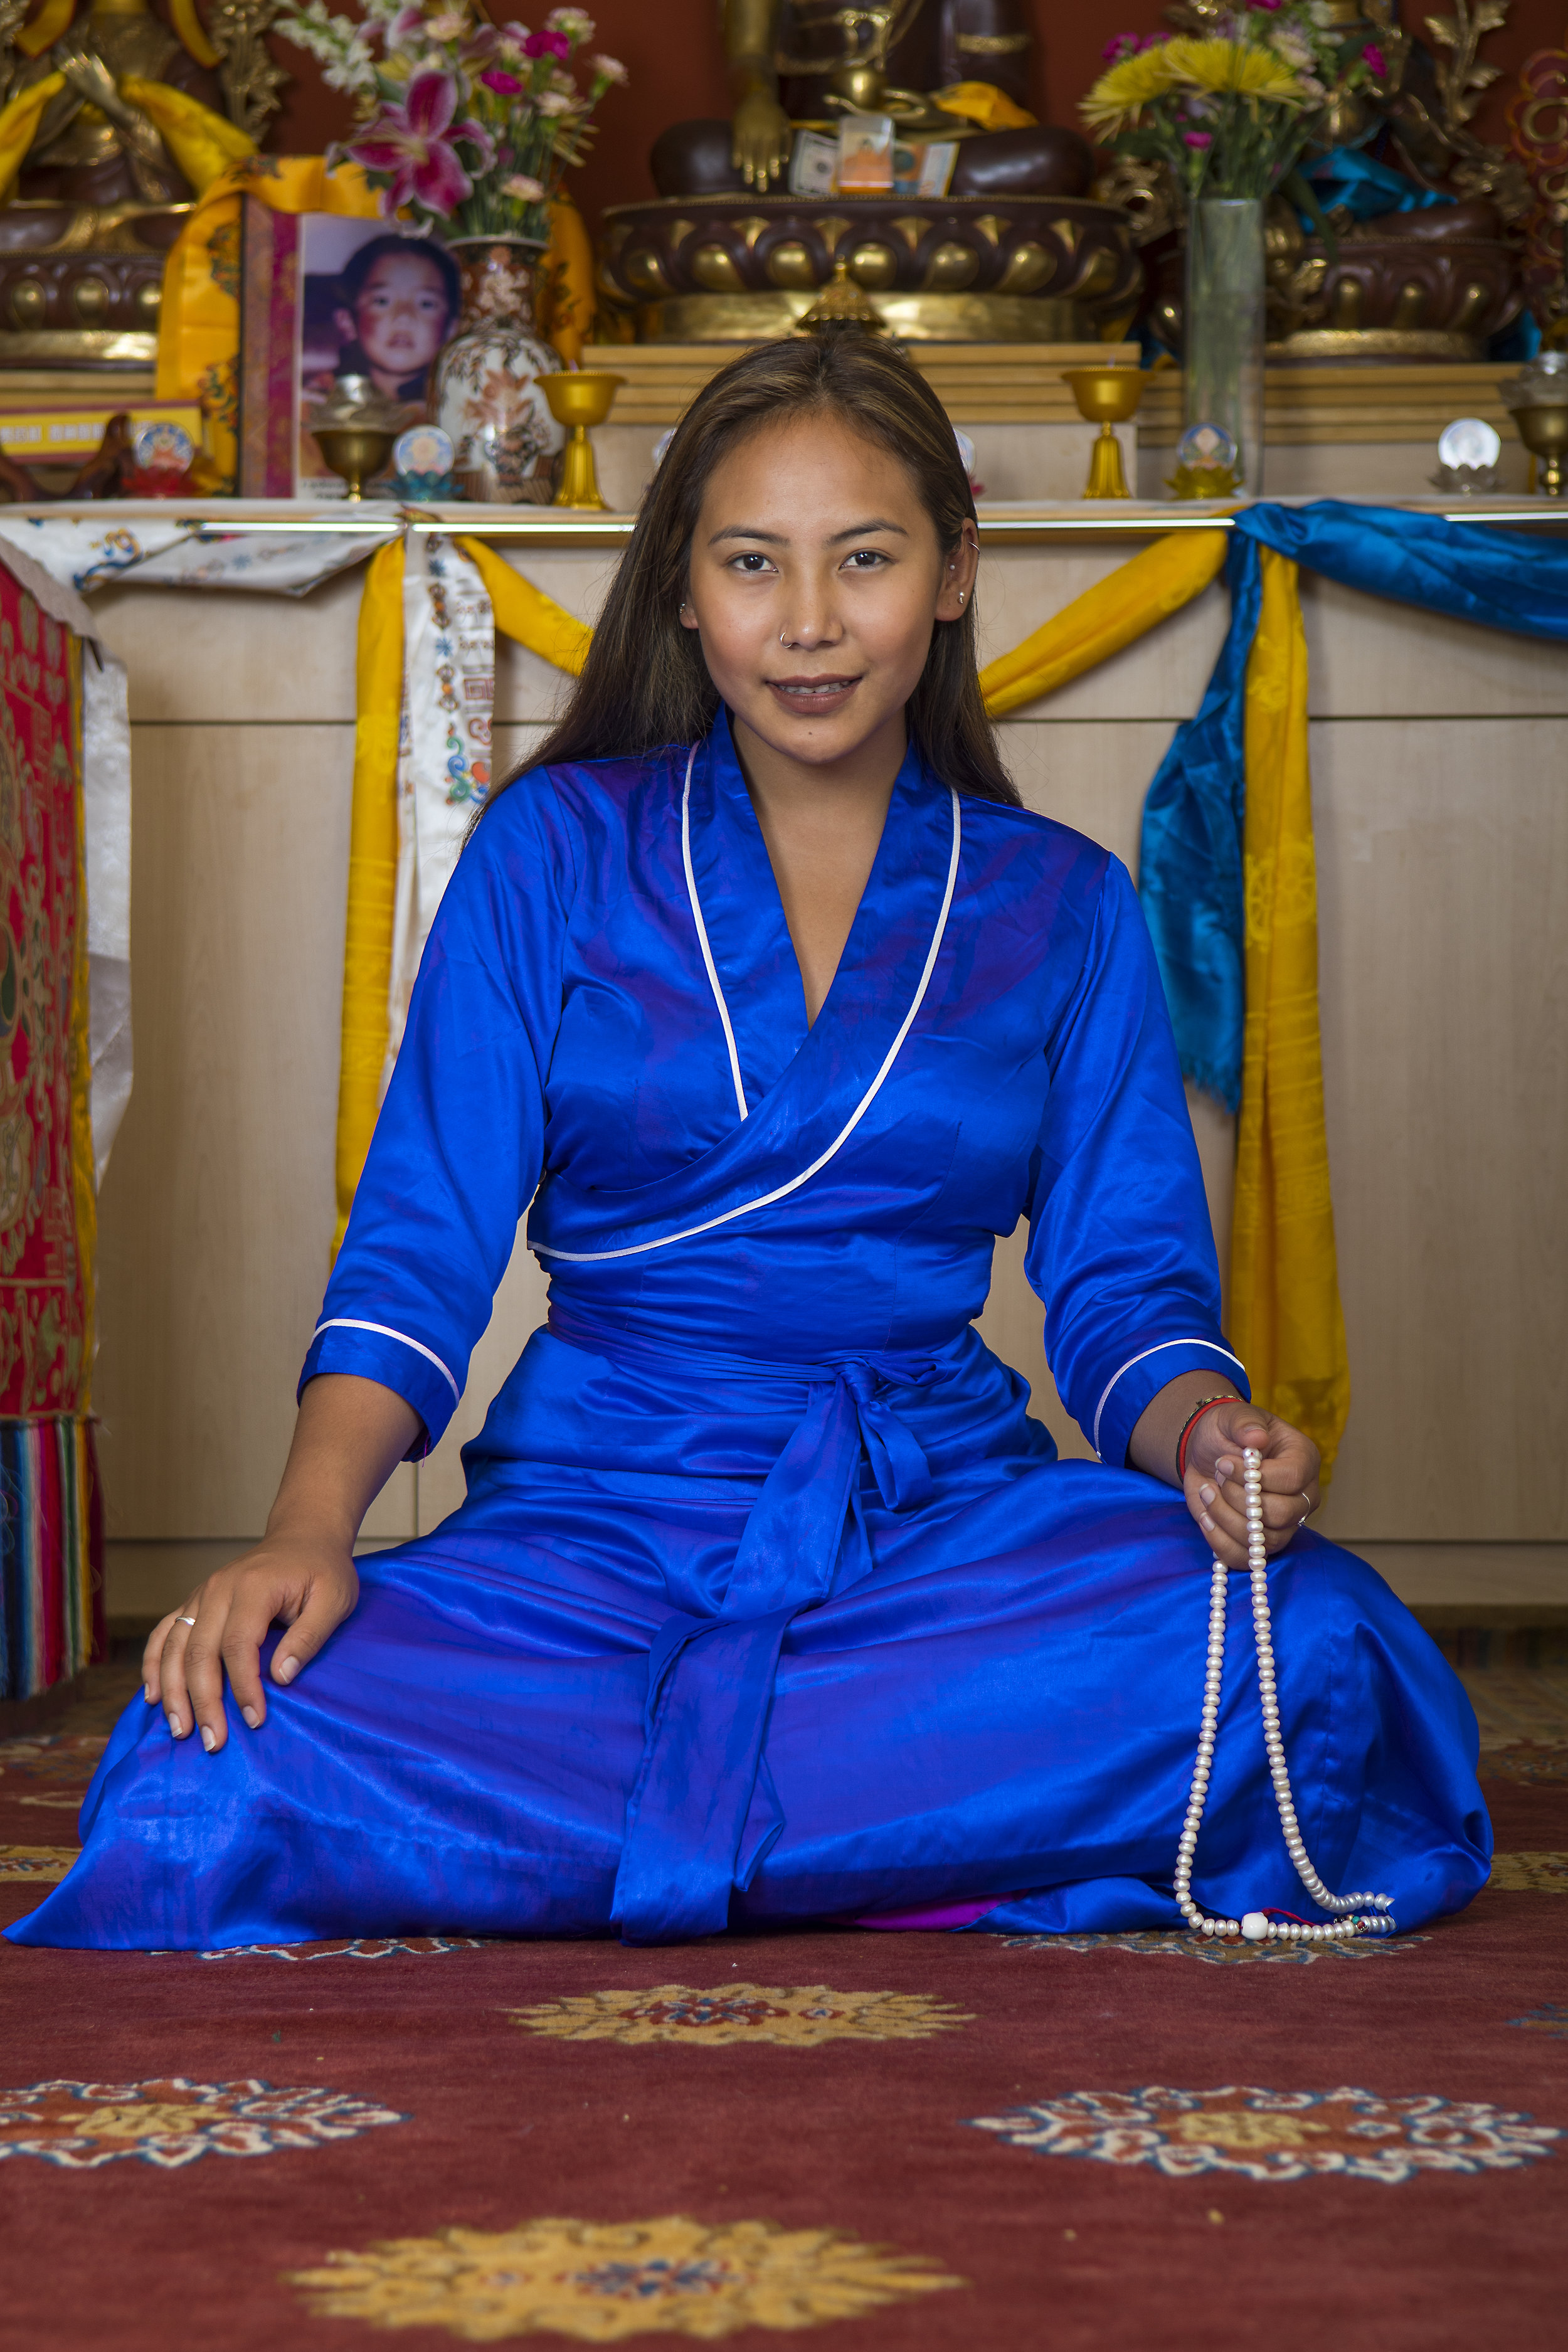 Chemi Lhamo - ShineBrightUTSC Presidential Candidate